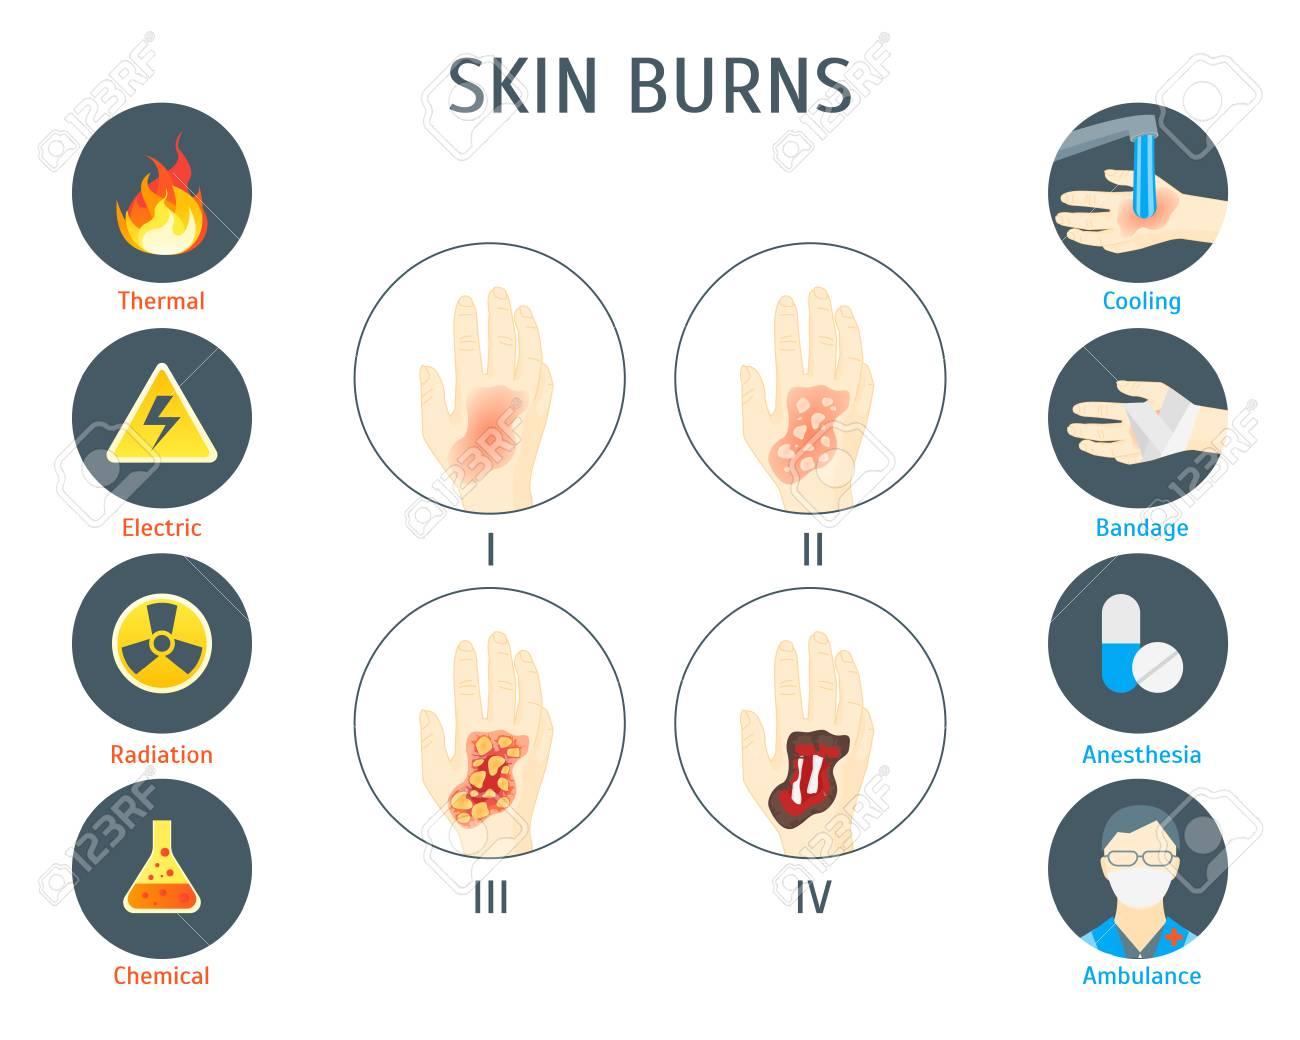 Human Skin Burns Info-graphic Card Poster. - 87211414